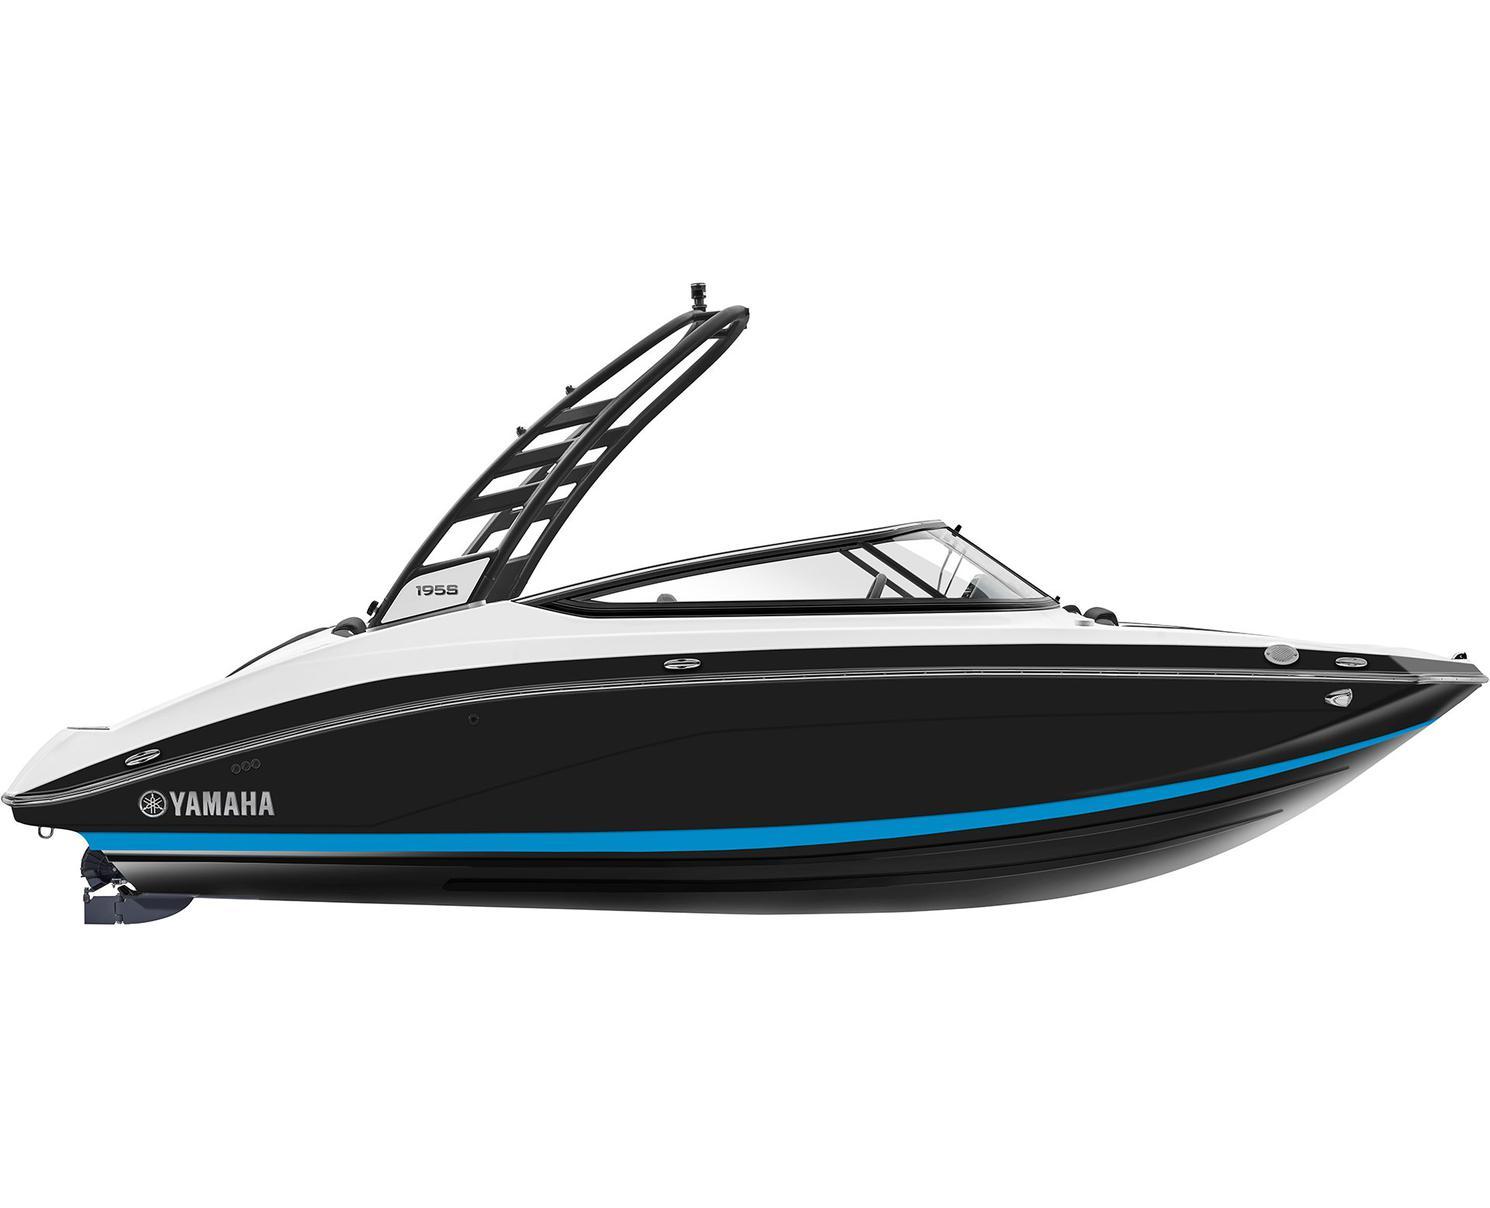 Yamaha 195S Noir 2022